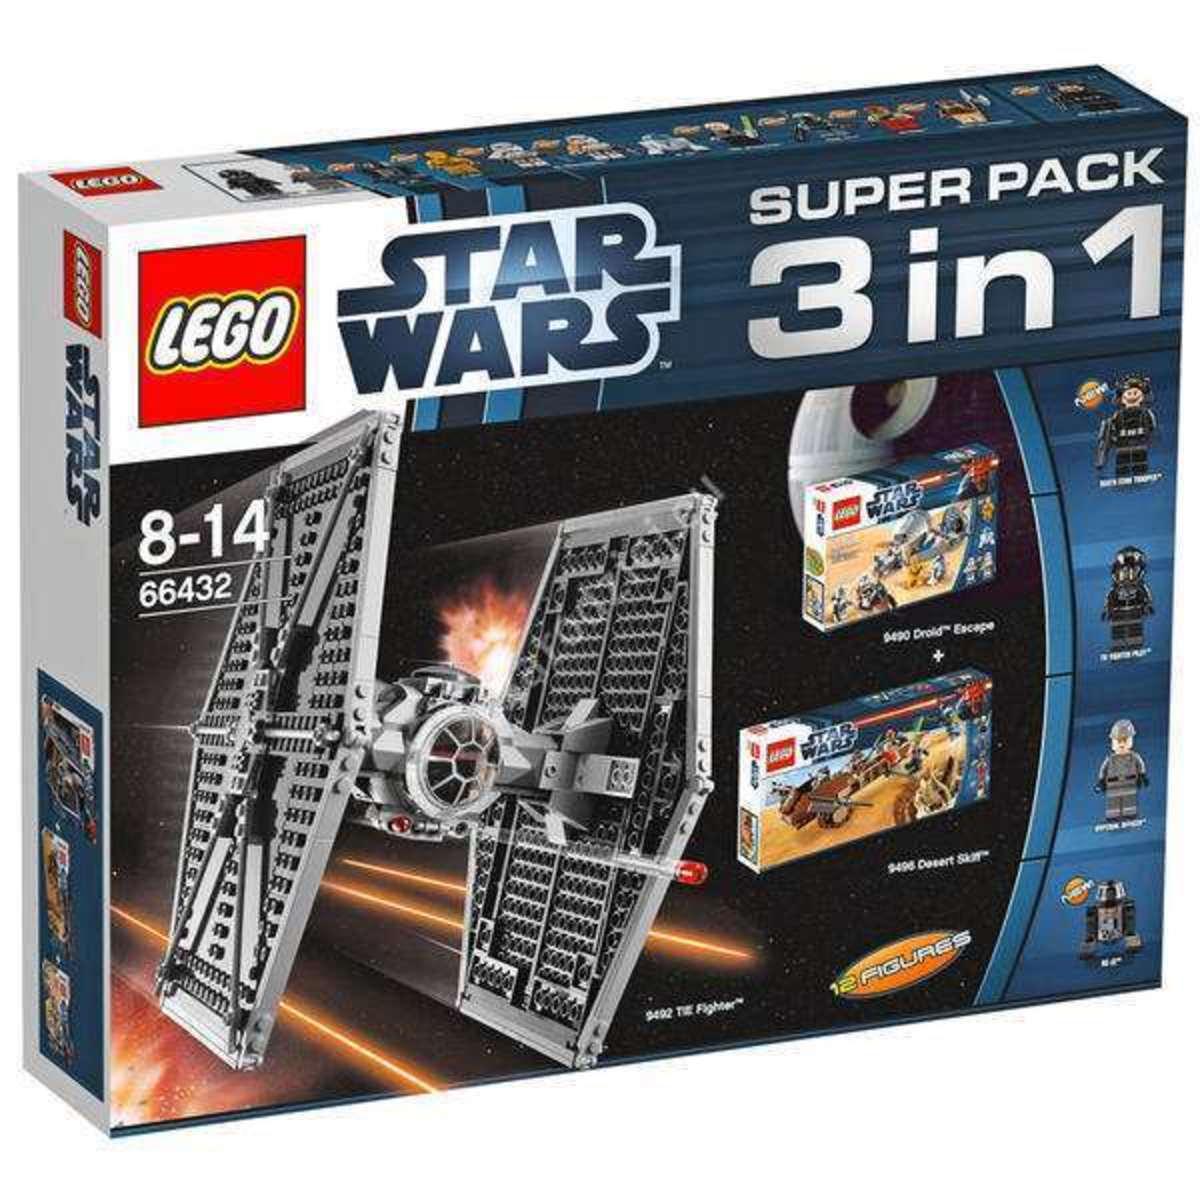 LEGO Star Wars Super Pack 3-in-1 66432 Box